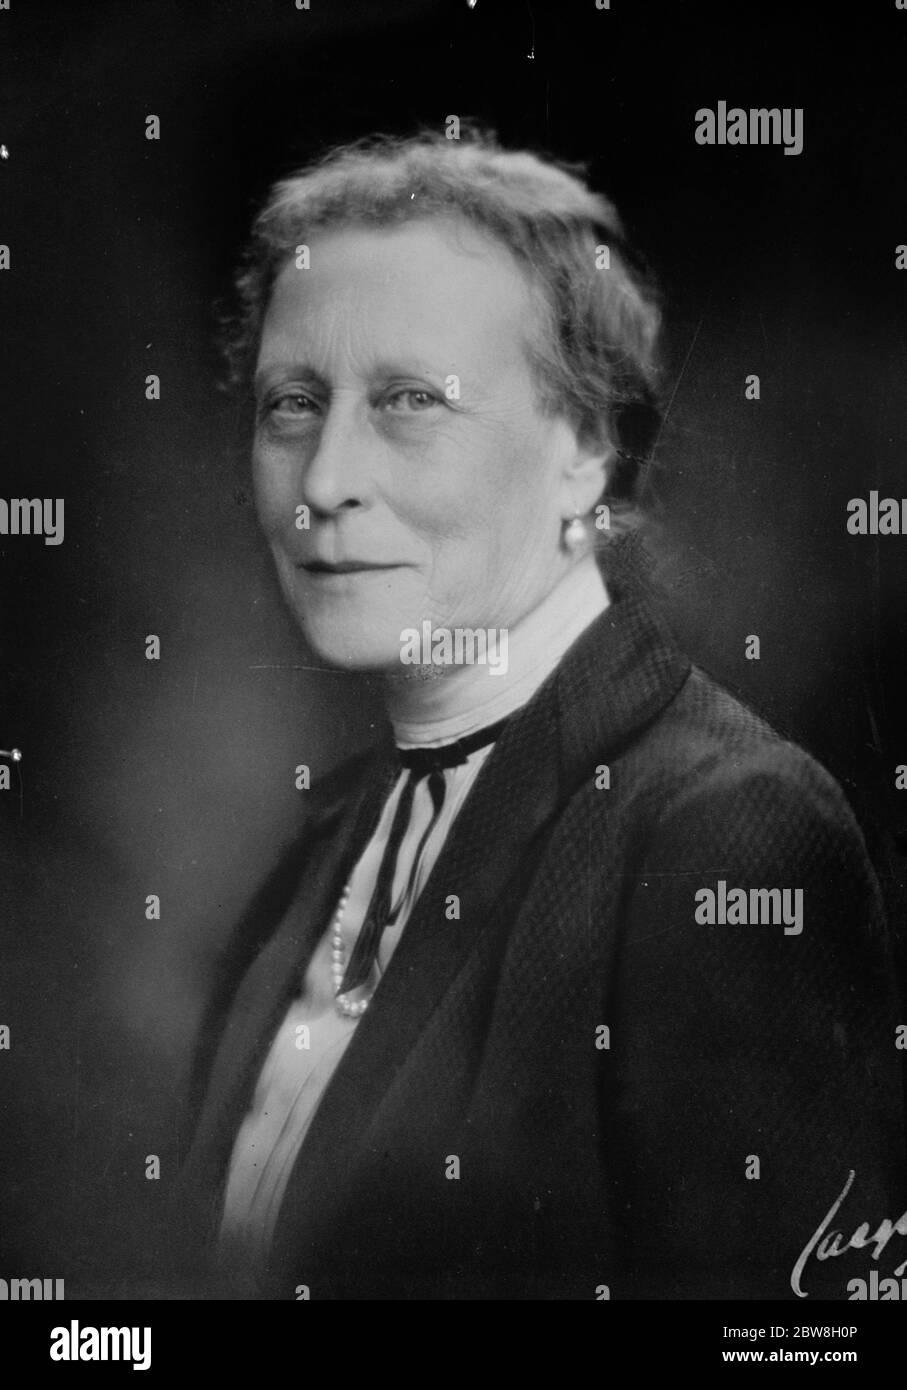 Nadejda Mountbatten, Marchioness of Milford Haven